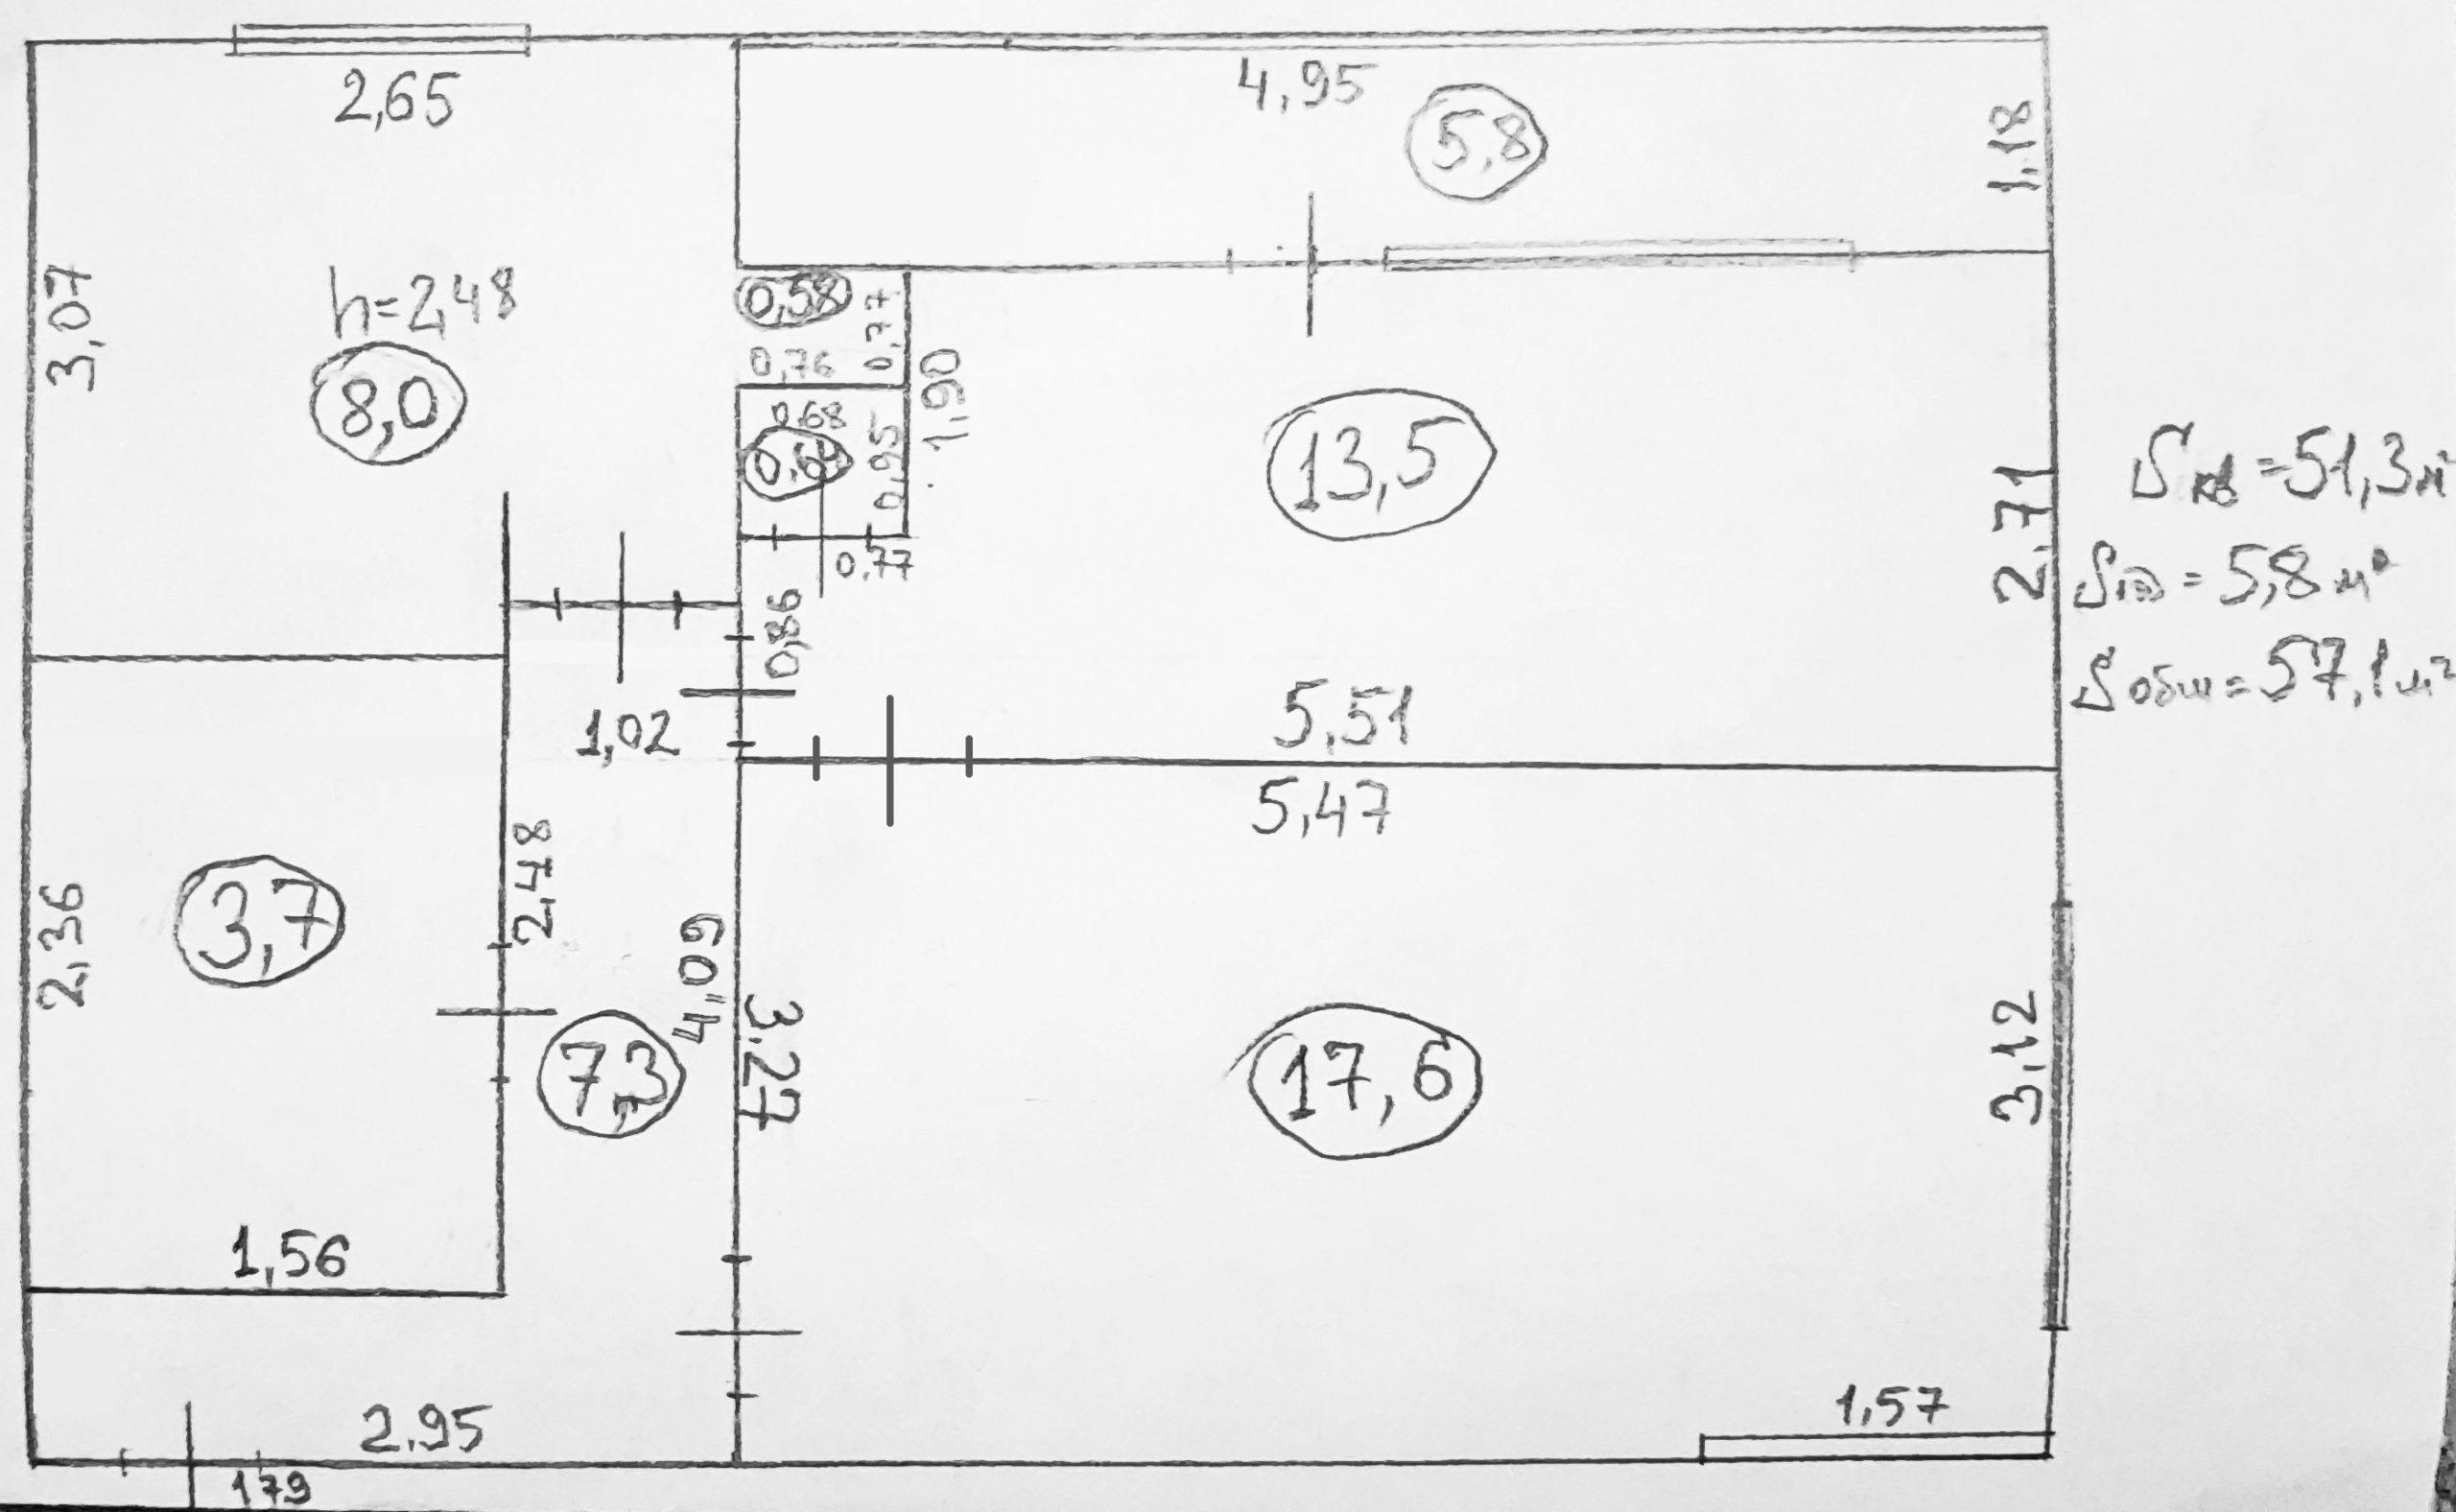 План двухкомнатной квартиры в башне Вулыха